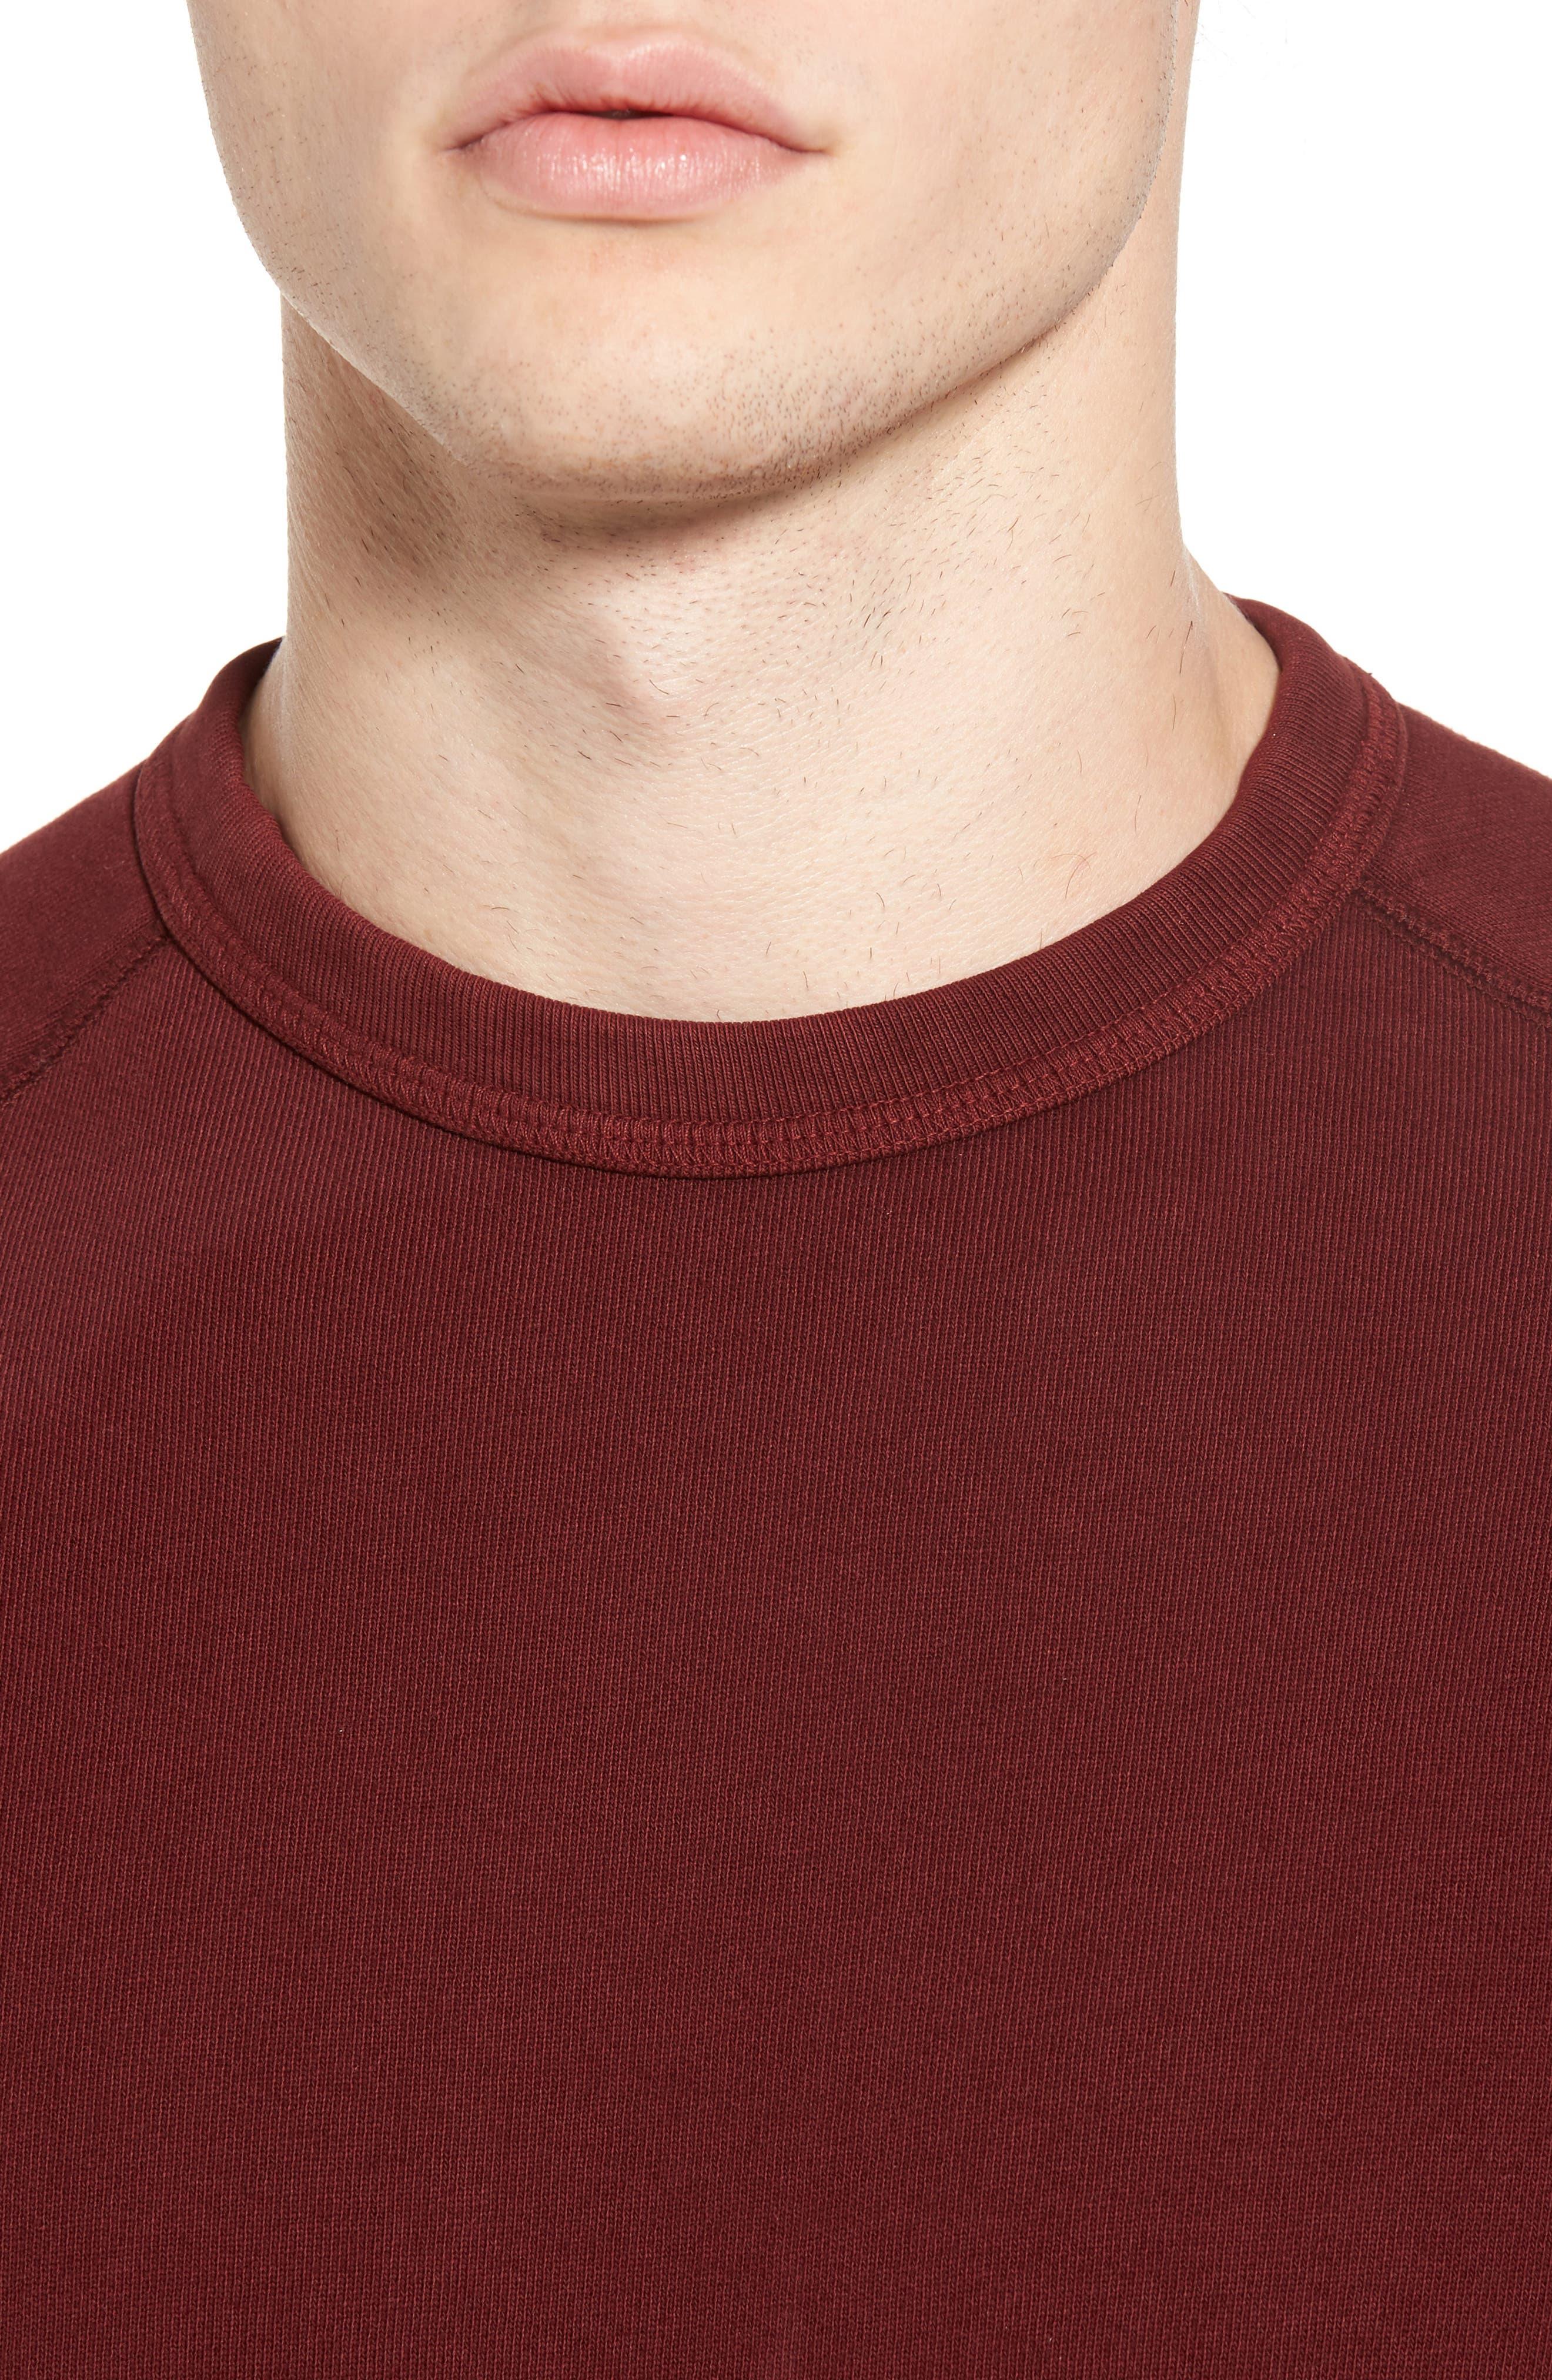 South Sea Raglan Sweatshirt,                             Alternate thumbnail 12, color,